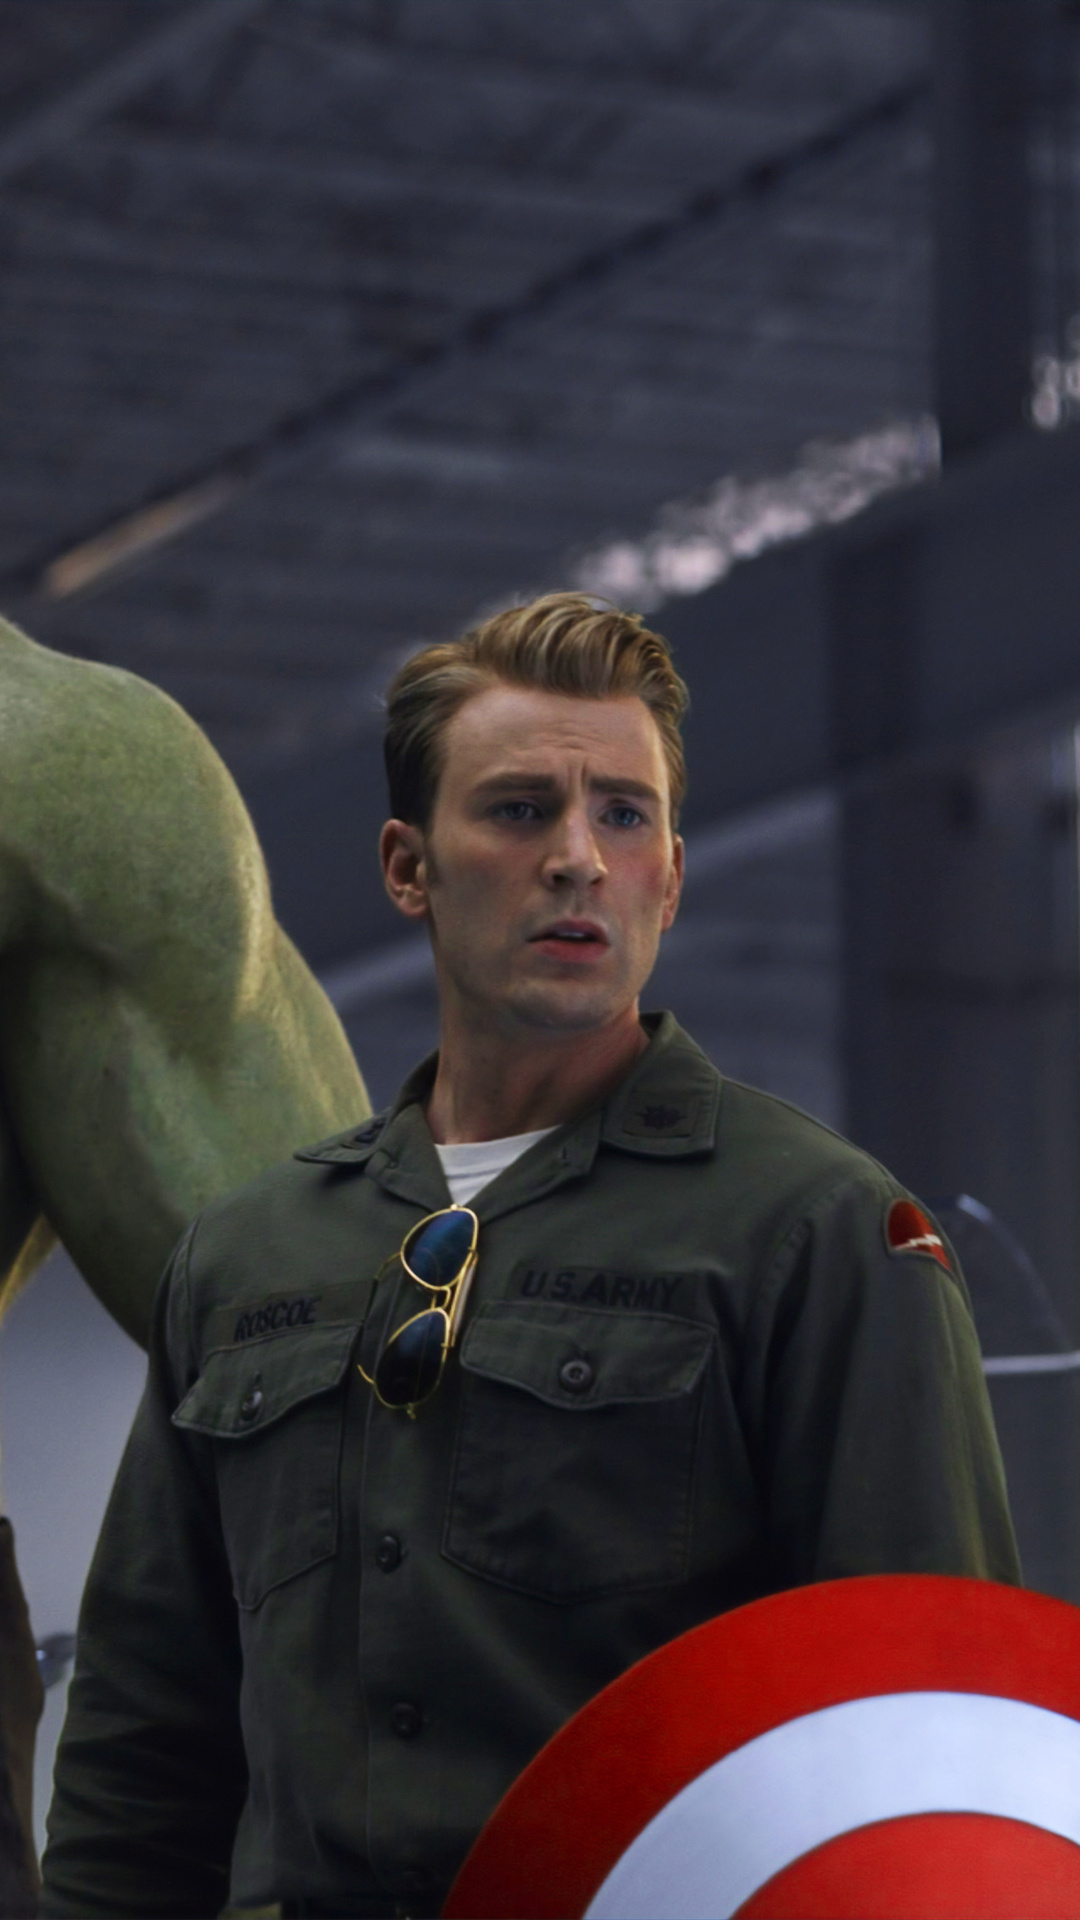 captain-america-and-hulk-time-travel-avengers-end-game-h7.jpg